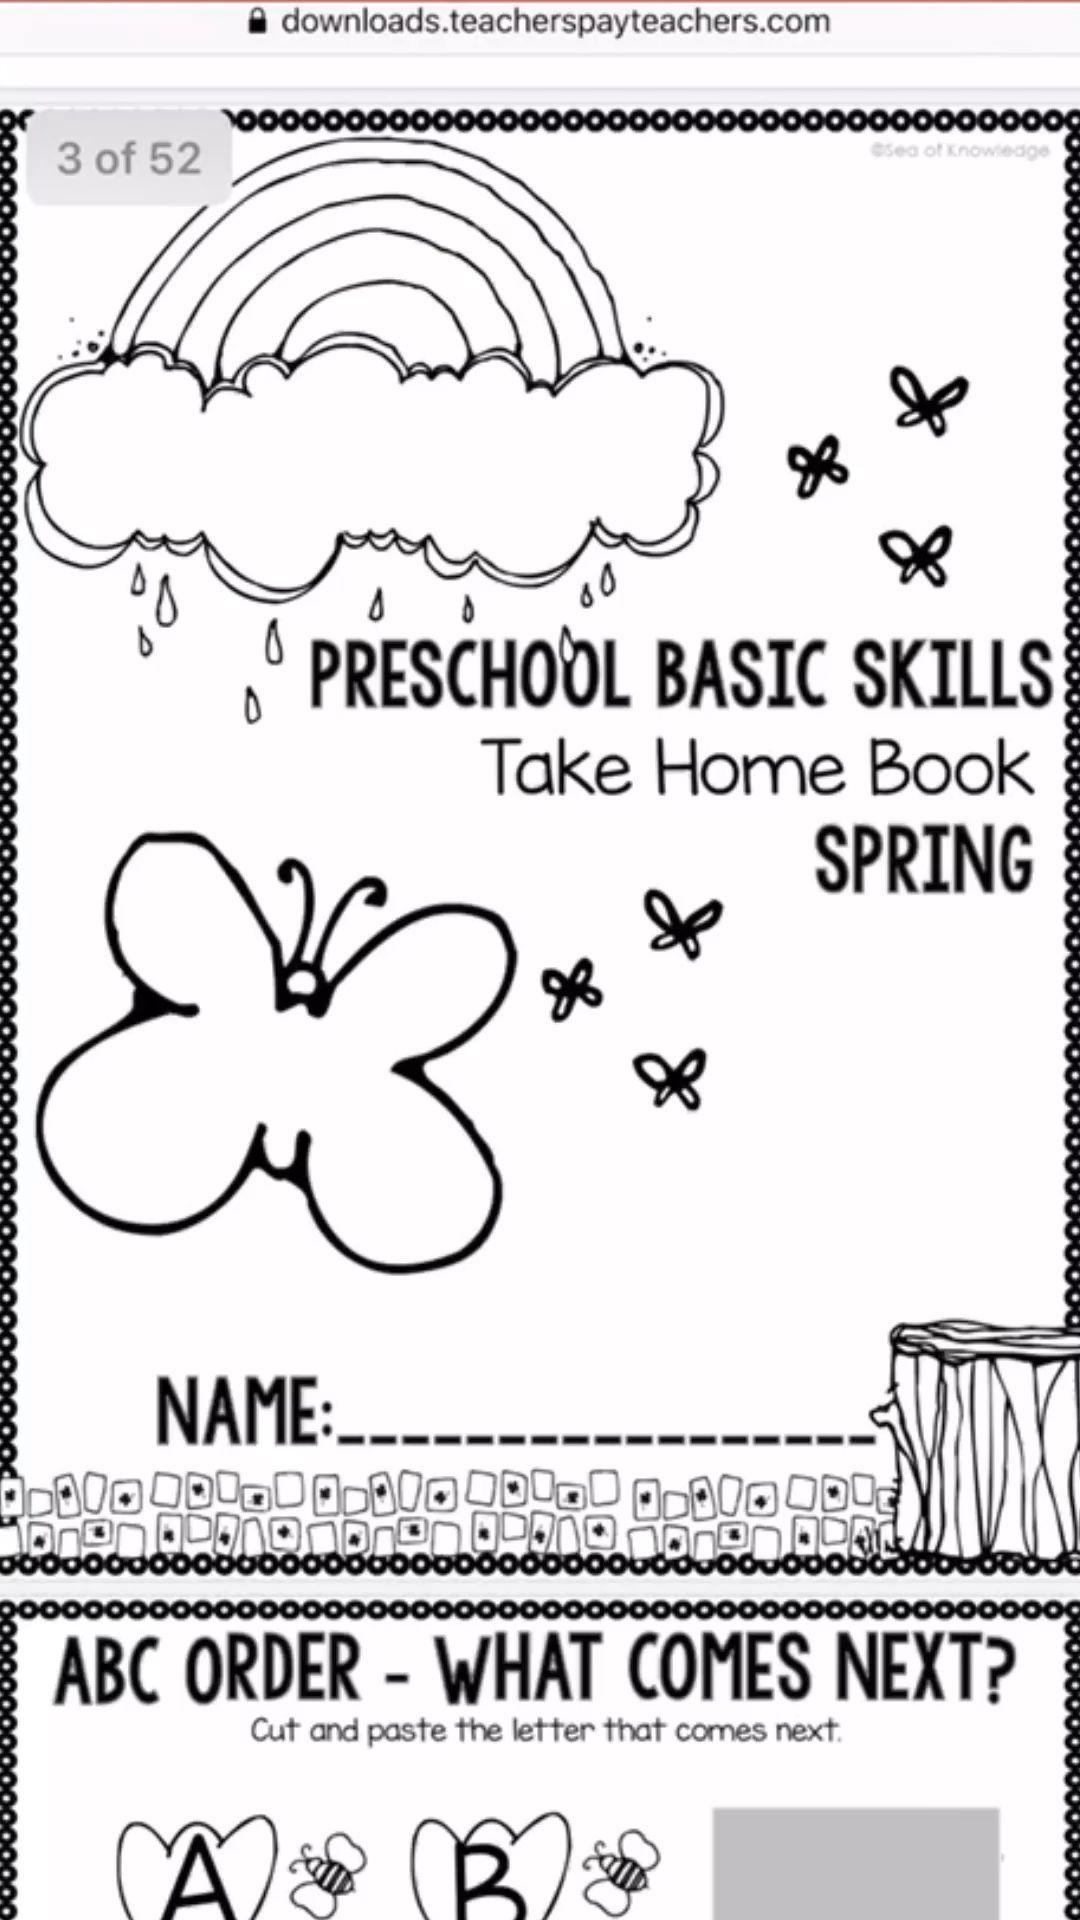 Preschool Worksheets Take Home Packet For Spring 4 Year Olds Home Olds Packet Preschool Spring Work Preschool Worksheets Preschool Preschool Activities [ 1920 x 1080 Pixel ]